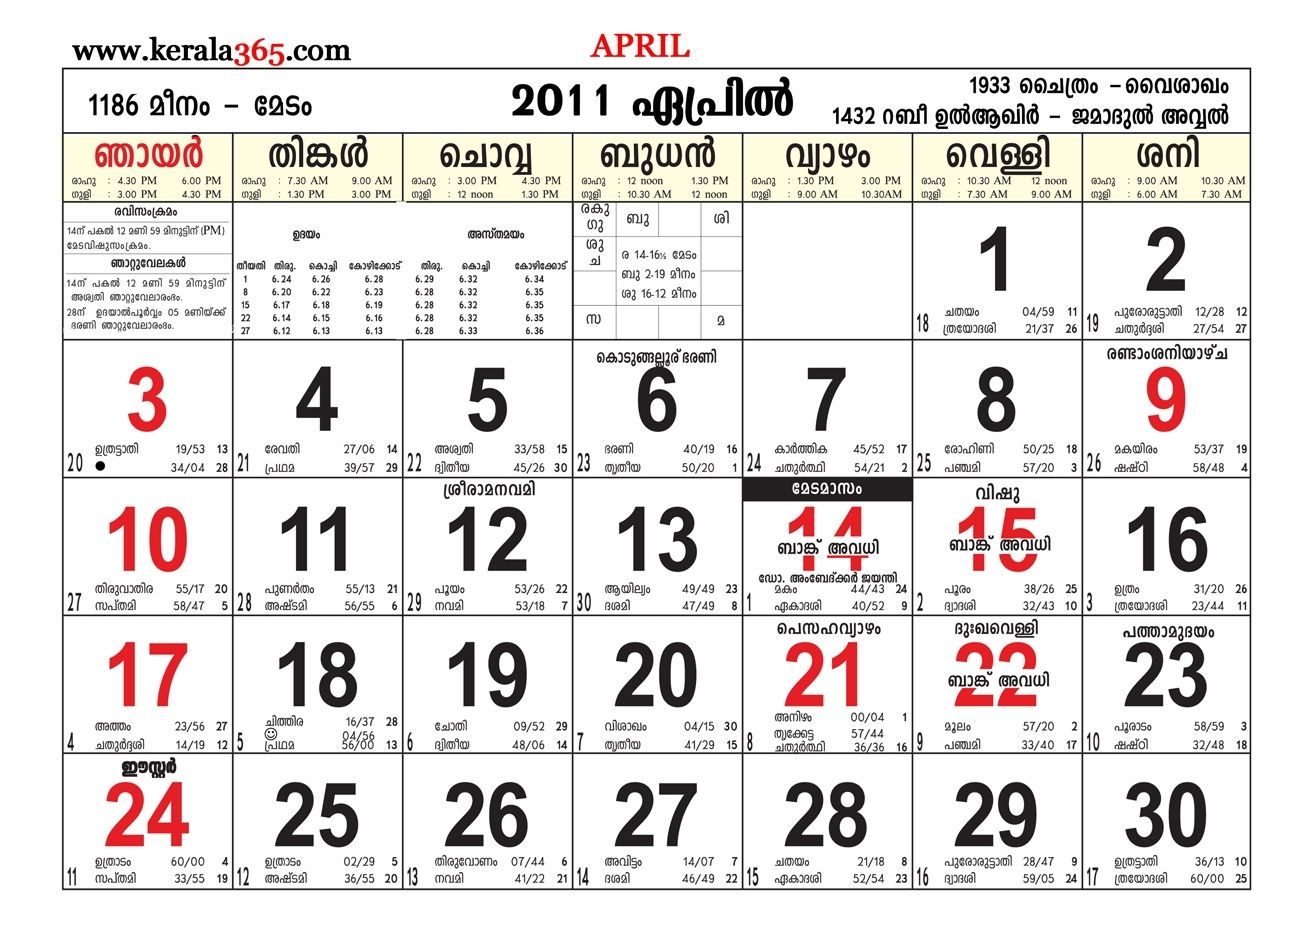 sports betting calendar 2013